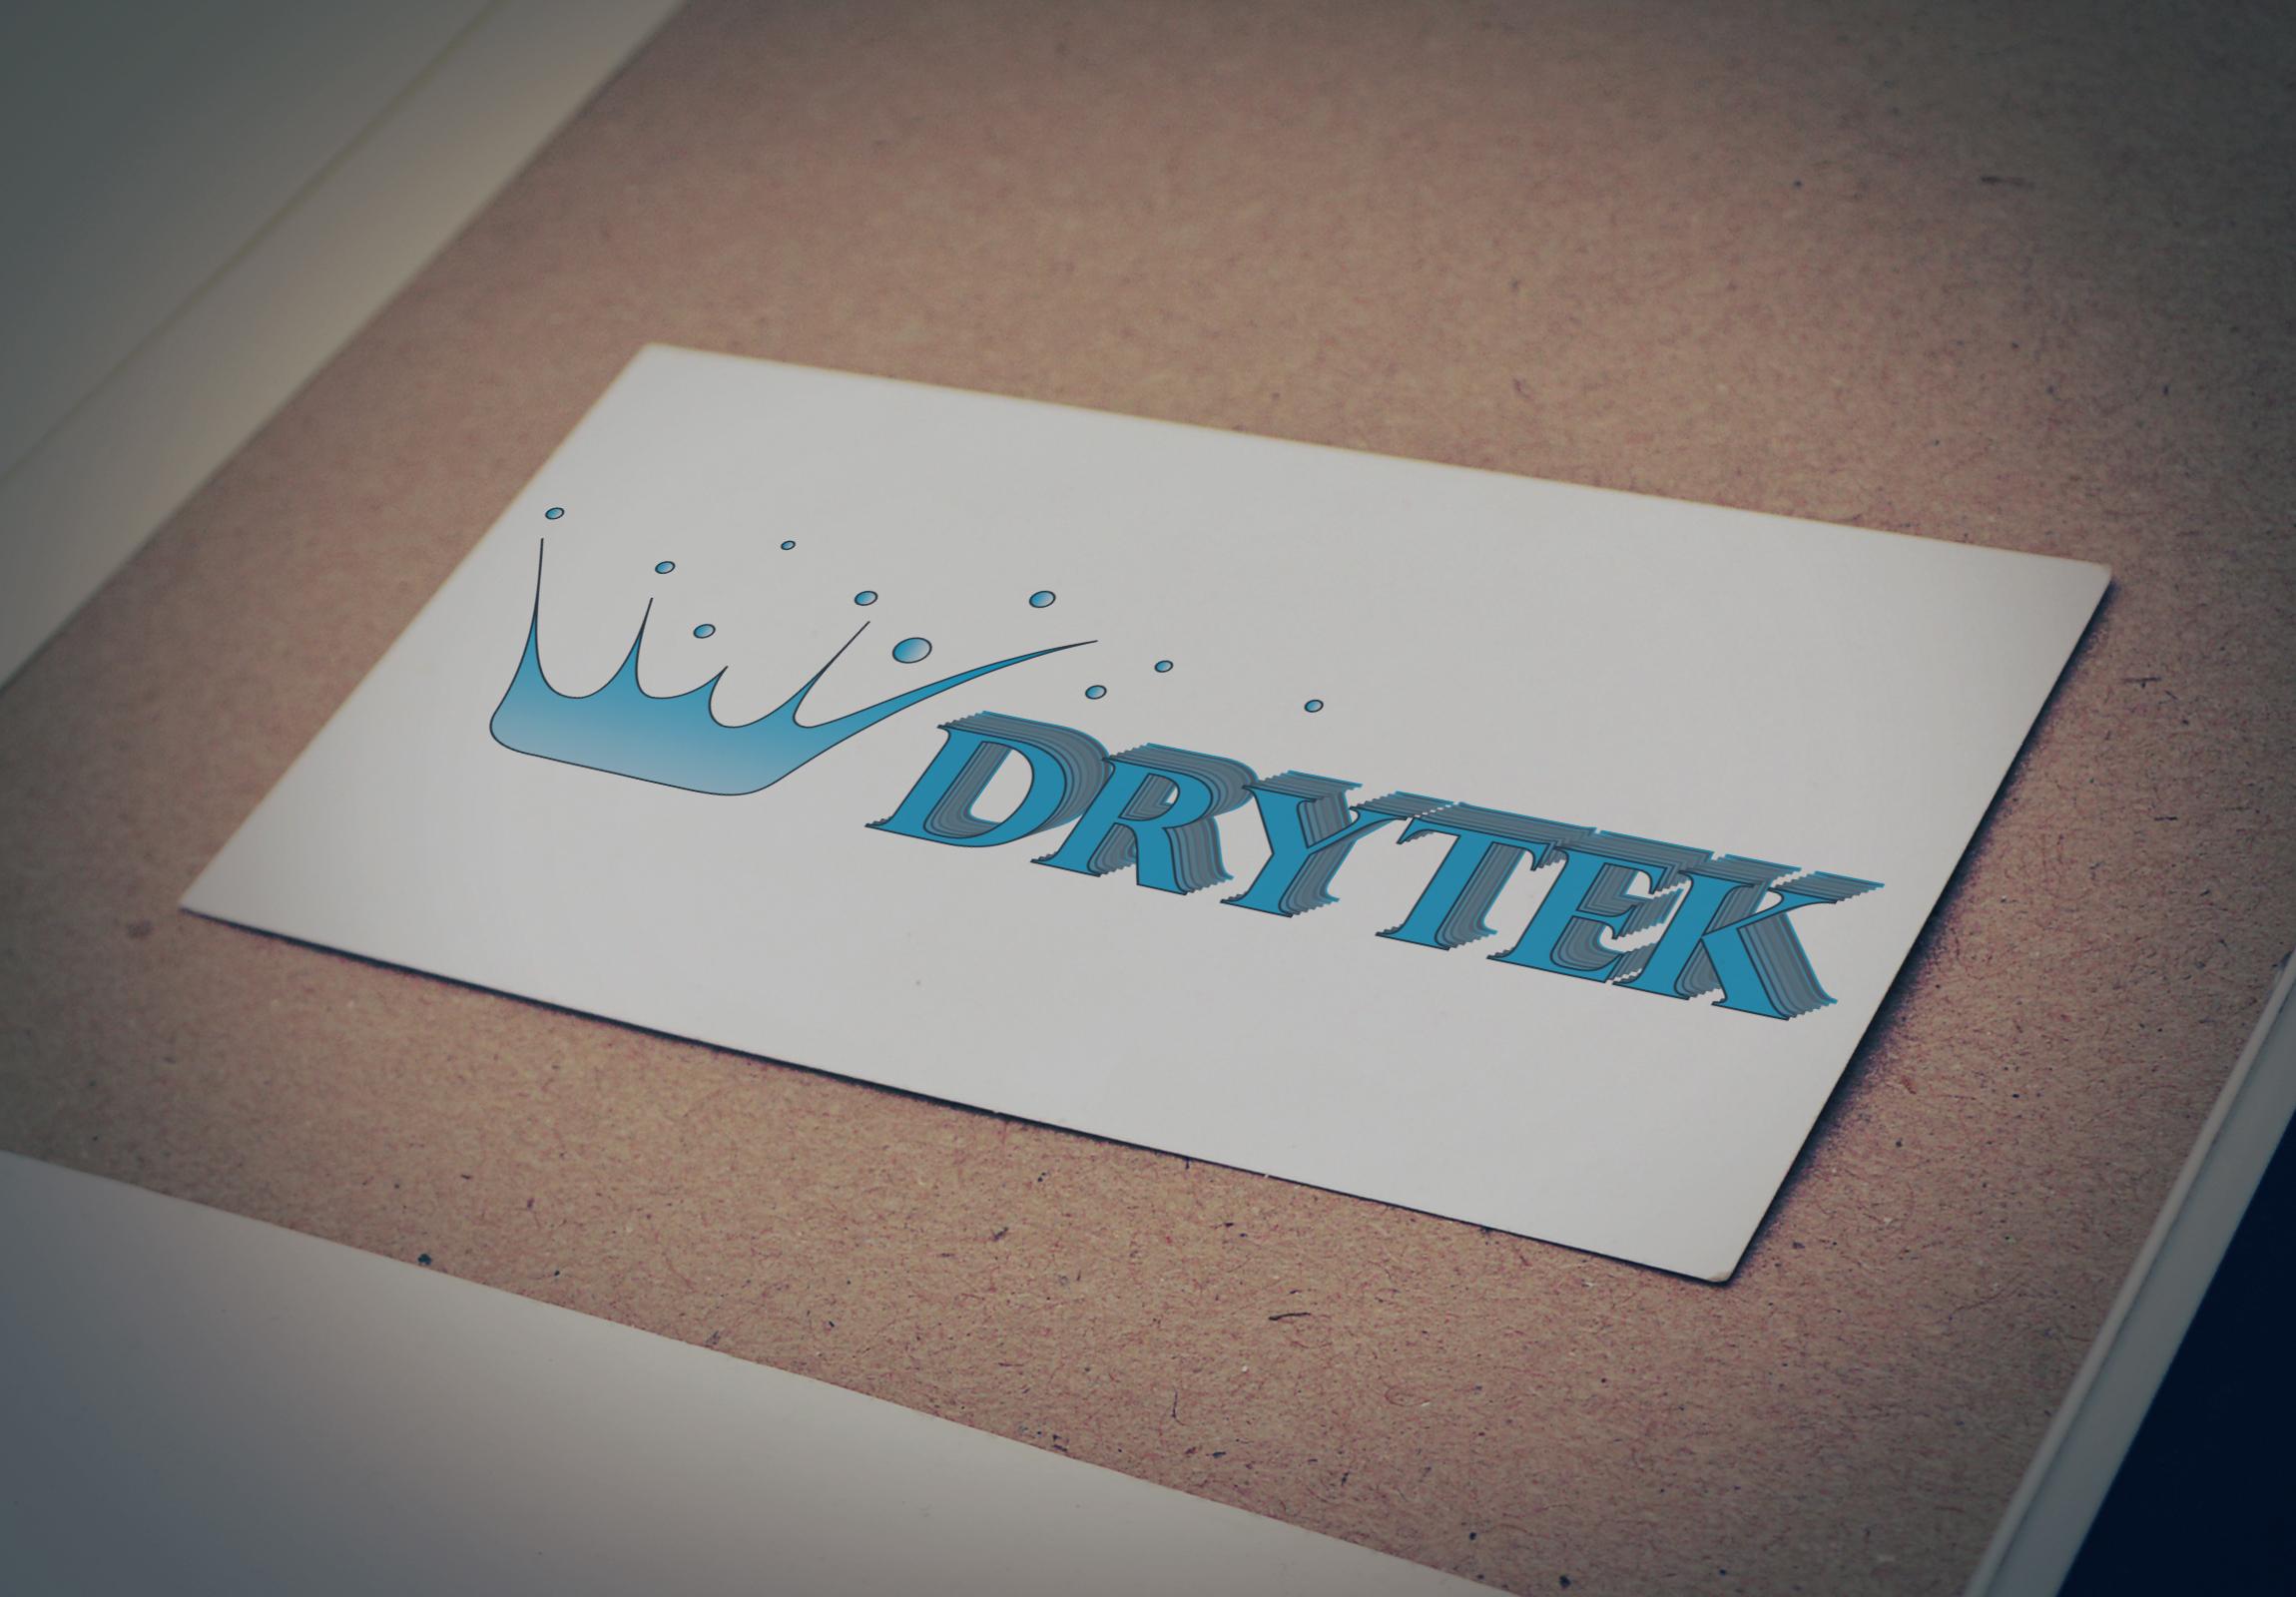 Создание логотипа для компании Drytek фото f_73459ba6350a50a3.jpg